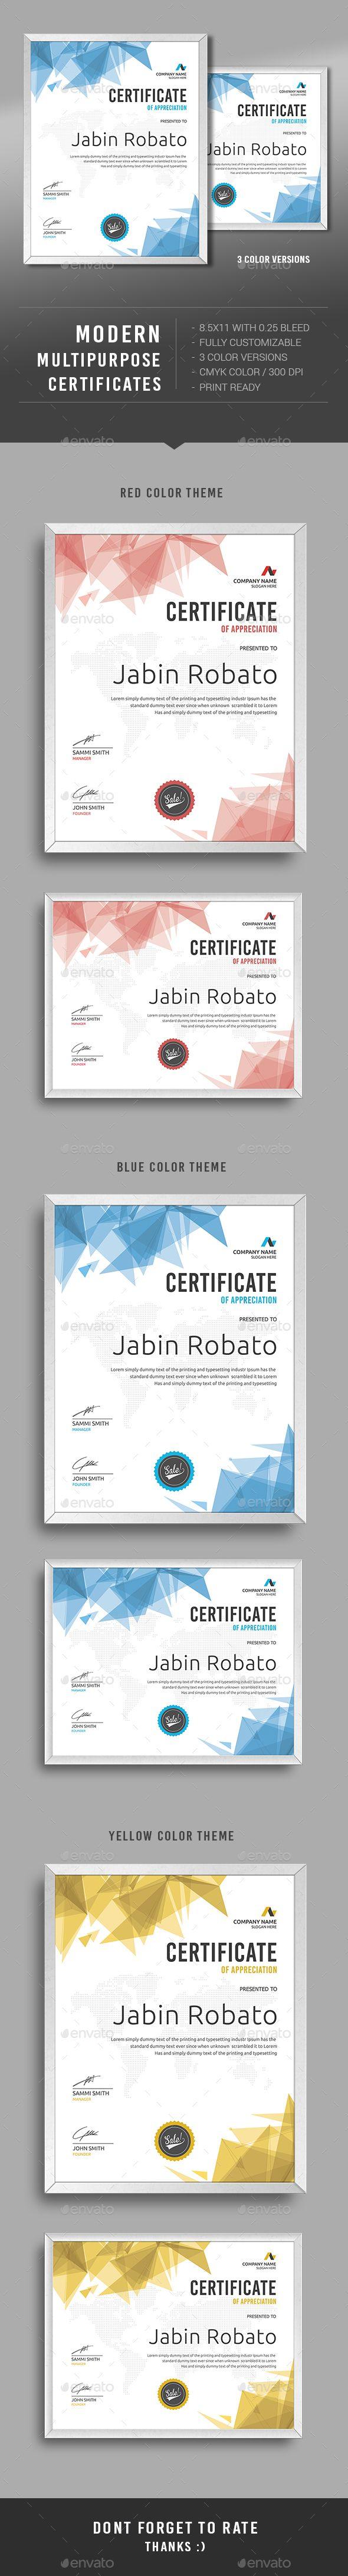 Modern Multipurpose Certificate PSD Design I Certificate Templates for multipurpose usage I Download: https://graphicriver.net/item/certificate/12869634?ref=jpixel55